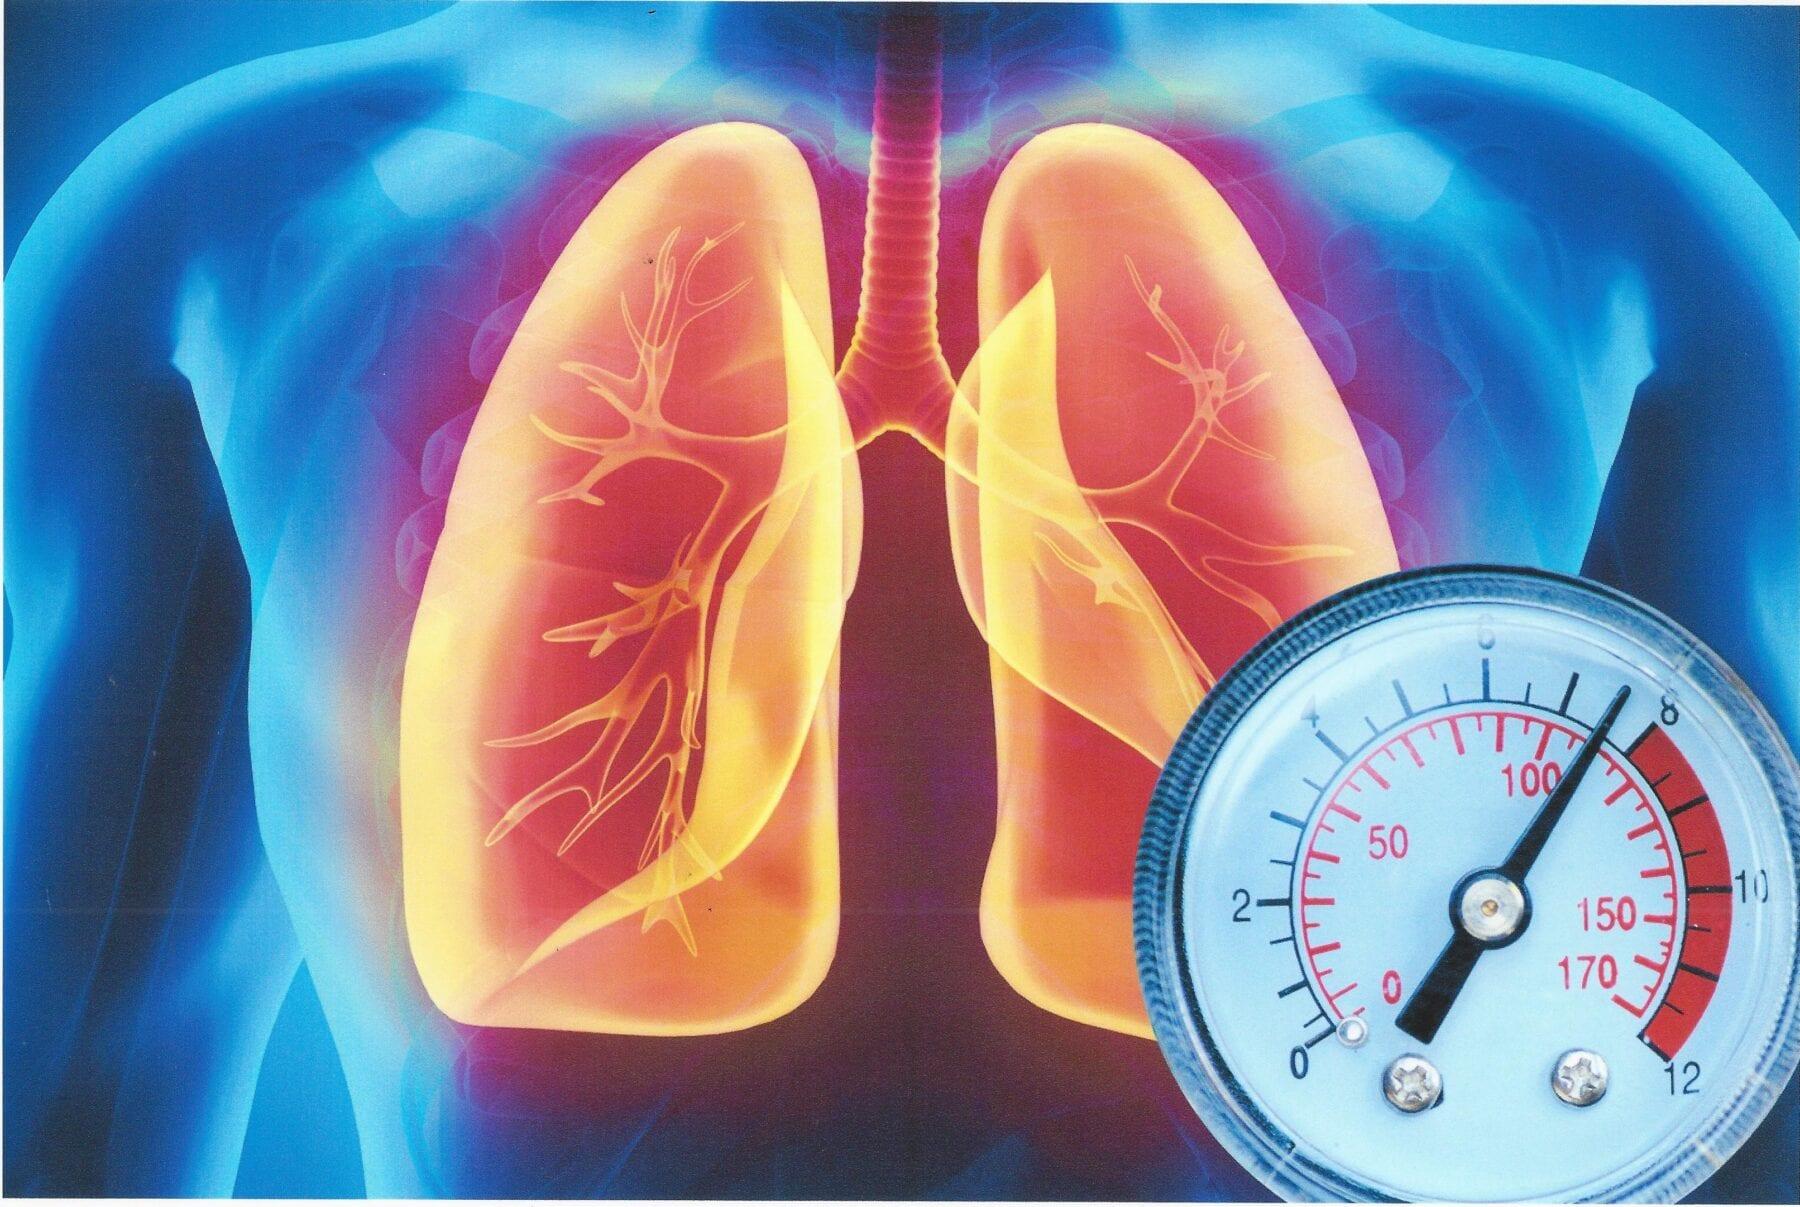 Prevent or control hypertension